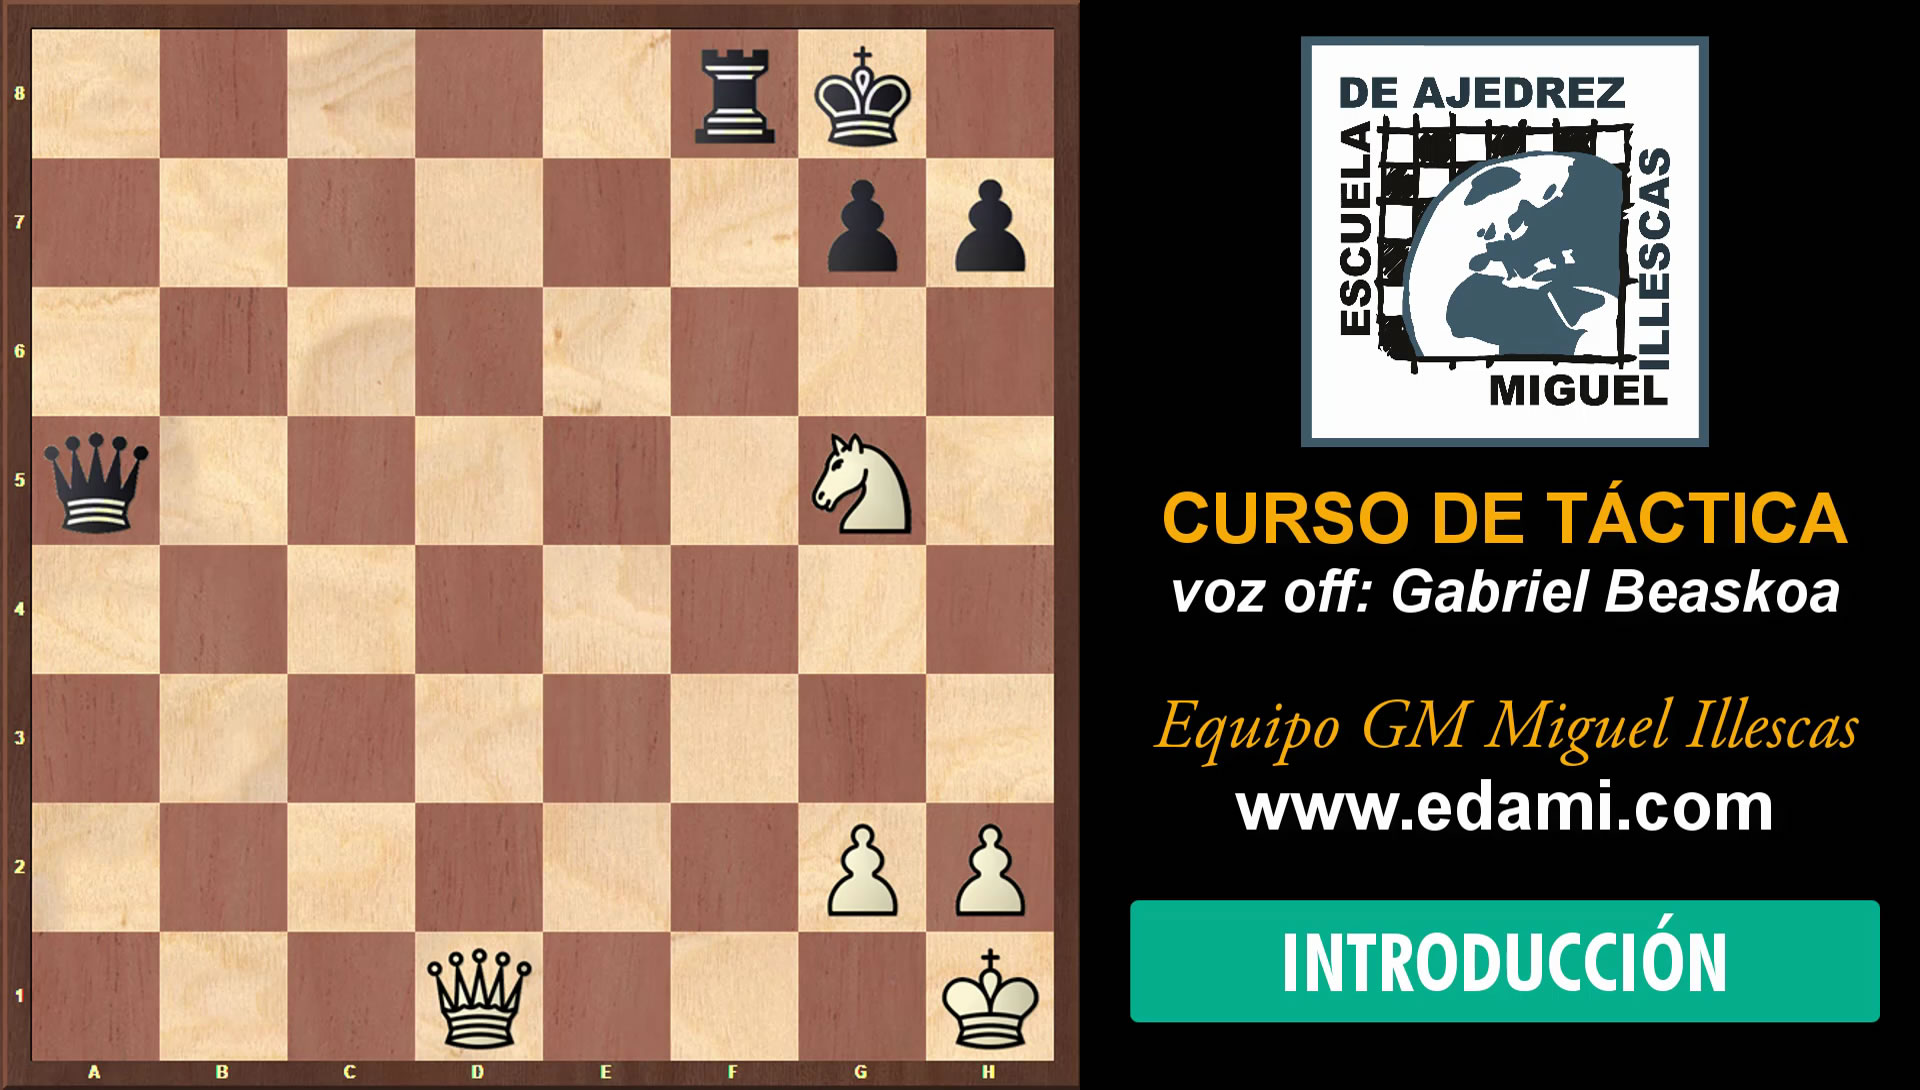 Curso de Táctica de ajedrez EDAMI #00 - Introducción